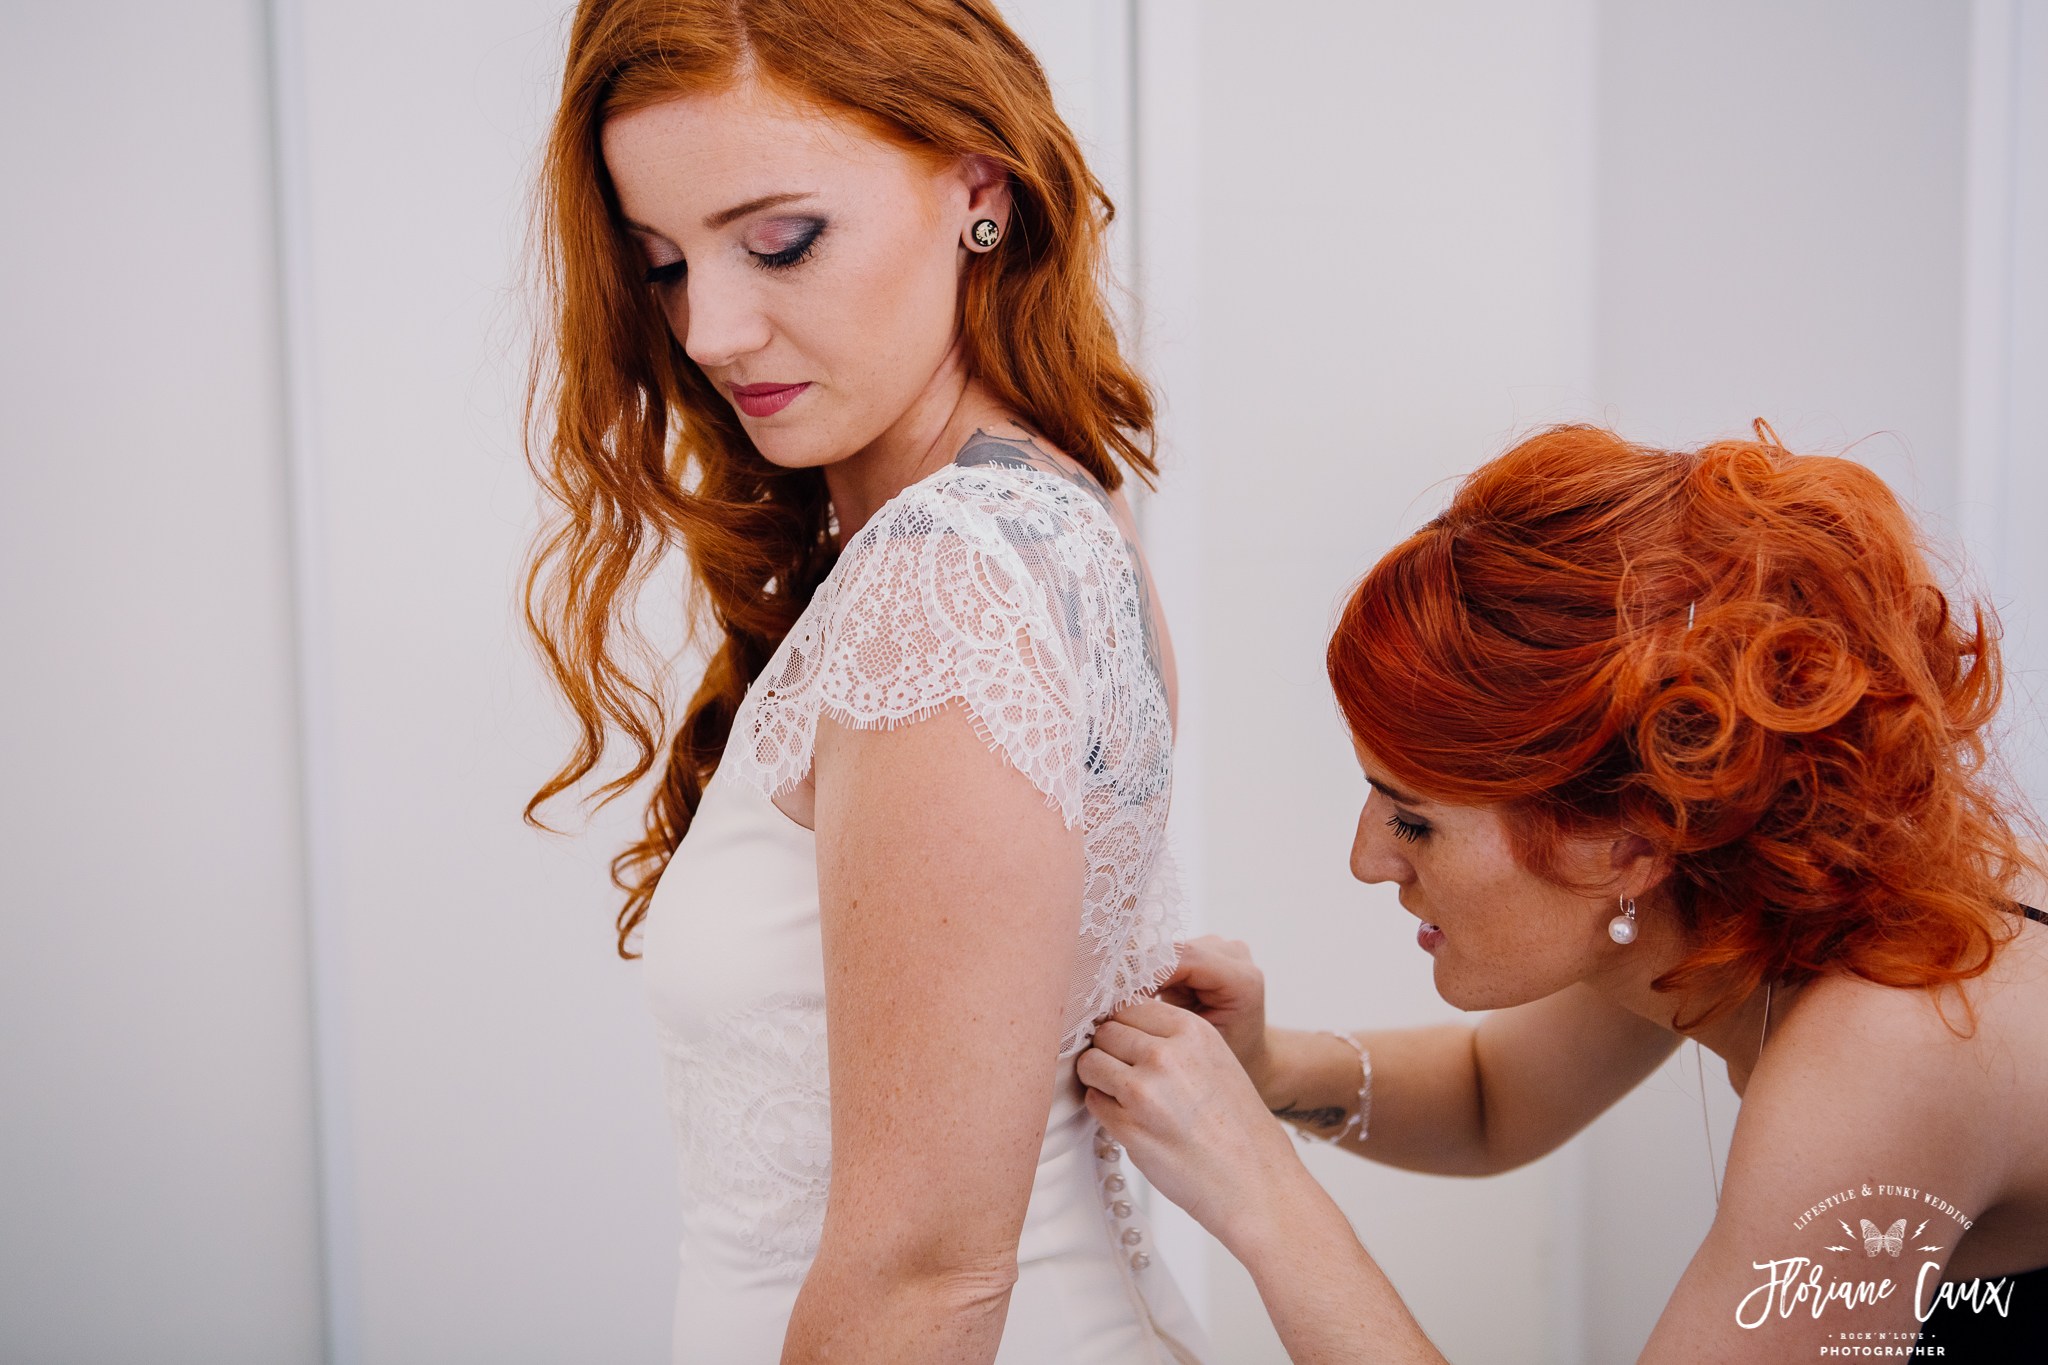 photographe-mariage-toulouse-rocknroll-maries-tatoues-floriane-caux-11